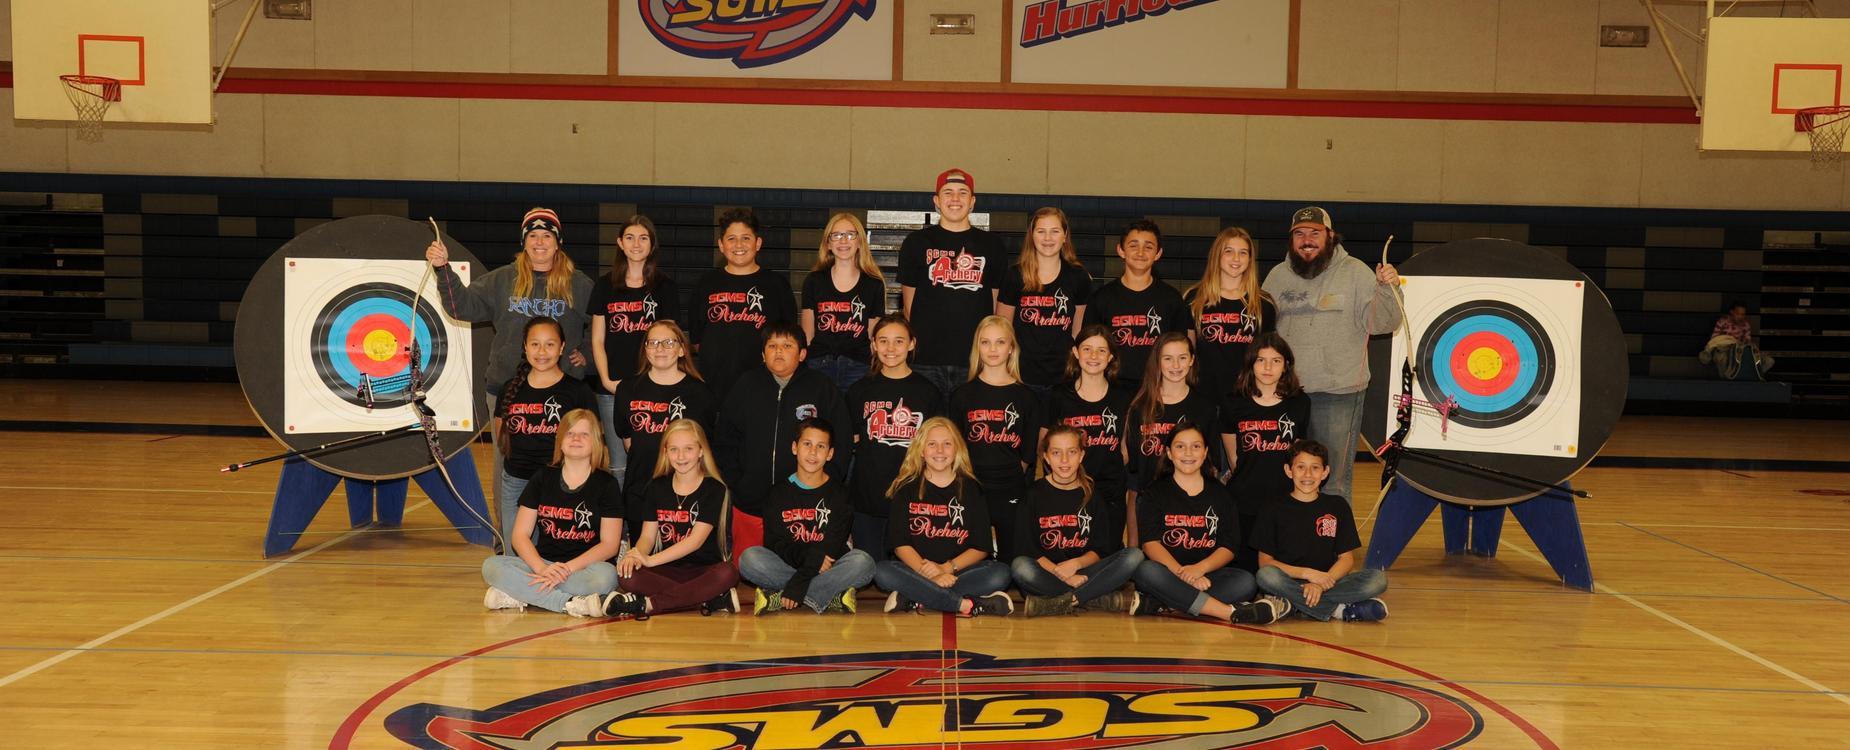 SGMS Archery team 17-18